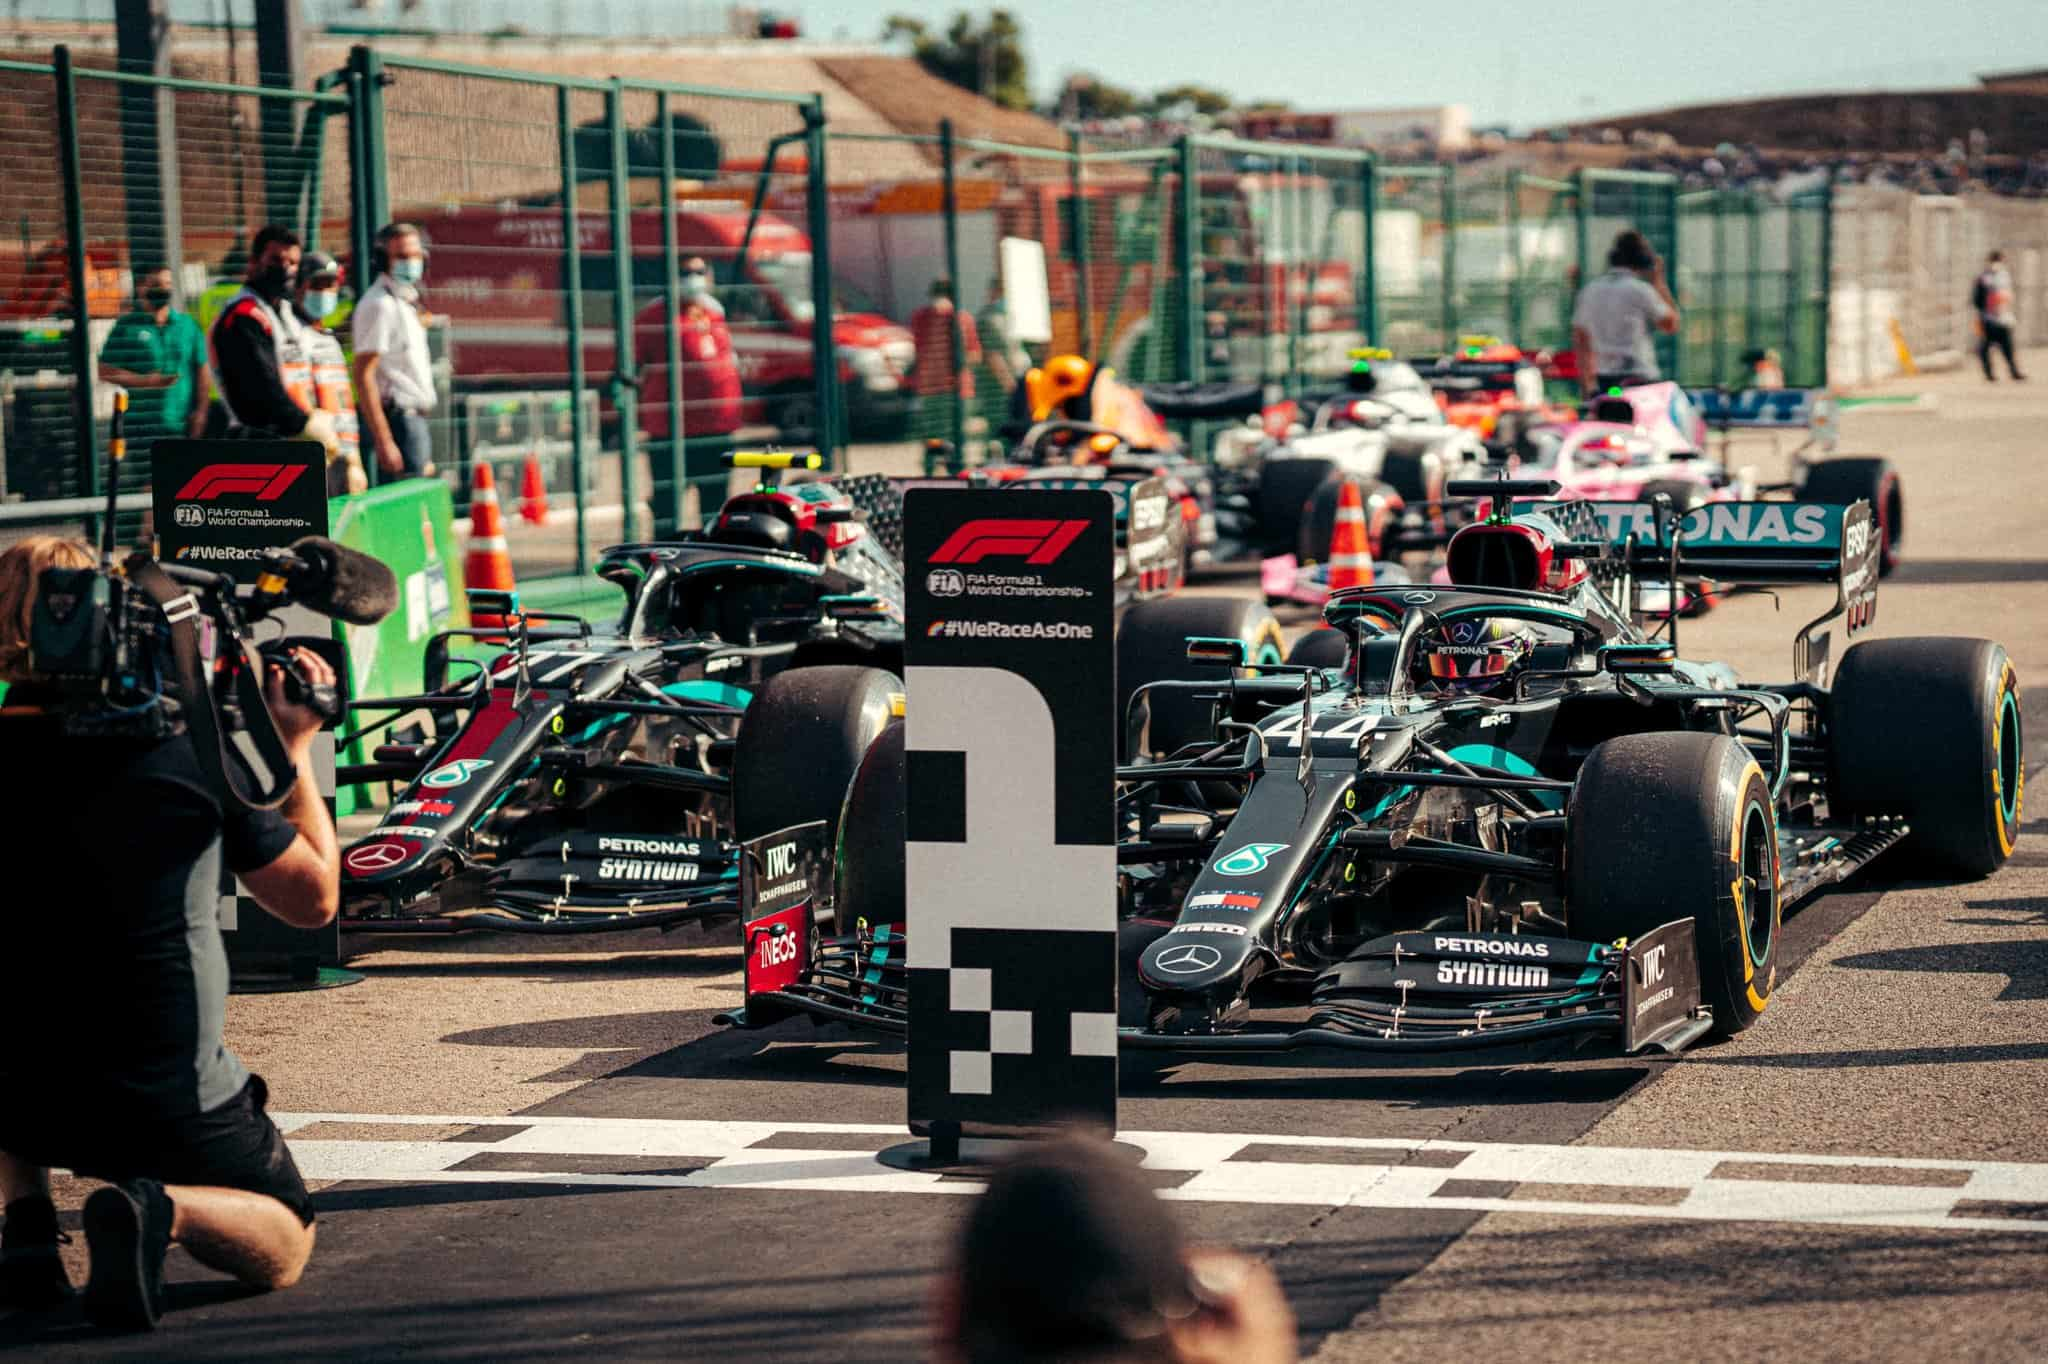 2020 Portugal GP Bottas Hamilton Mercedes F1 W11 after qualifying Photo Daimler Mercedes AMG Twitter